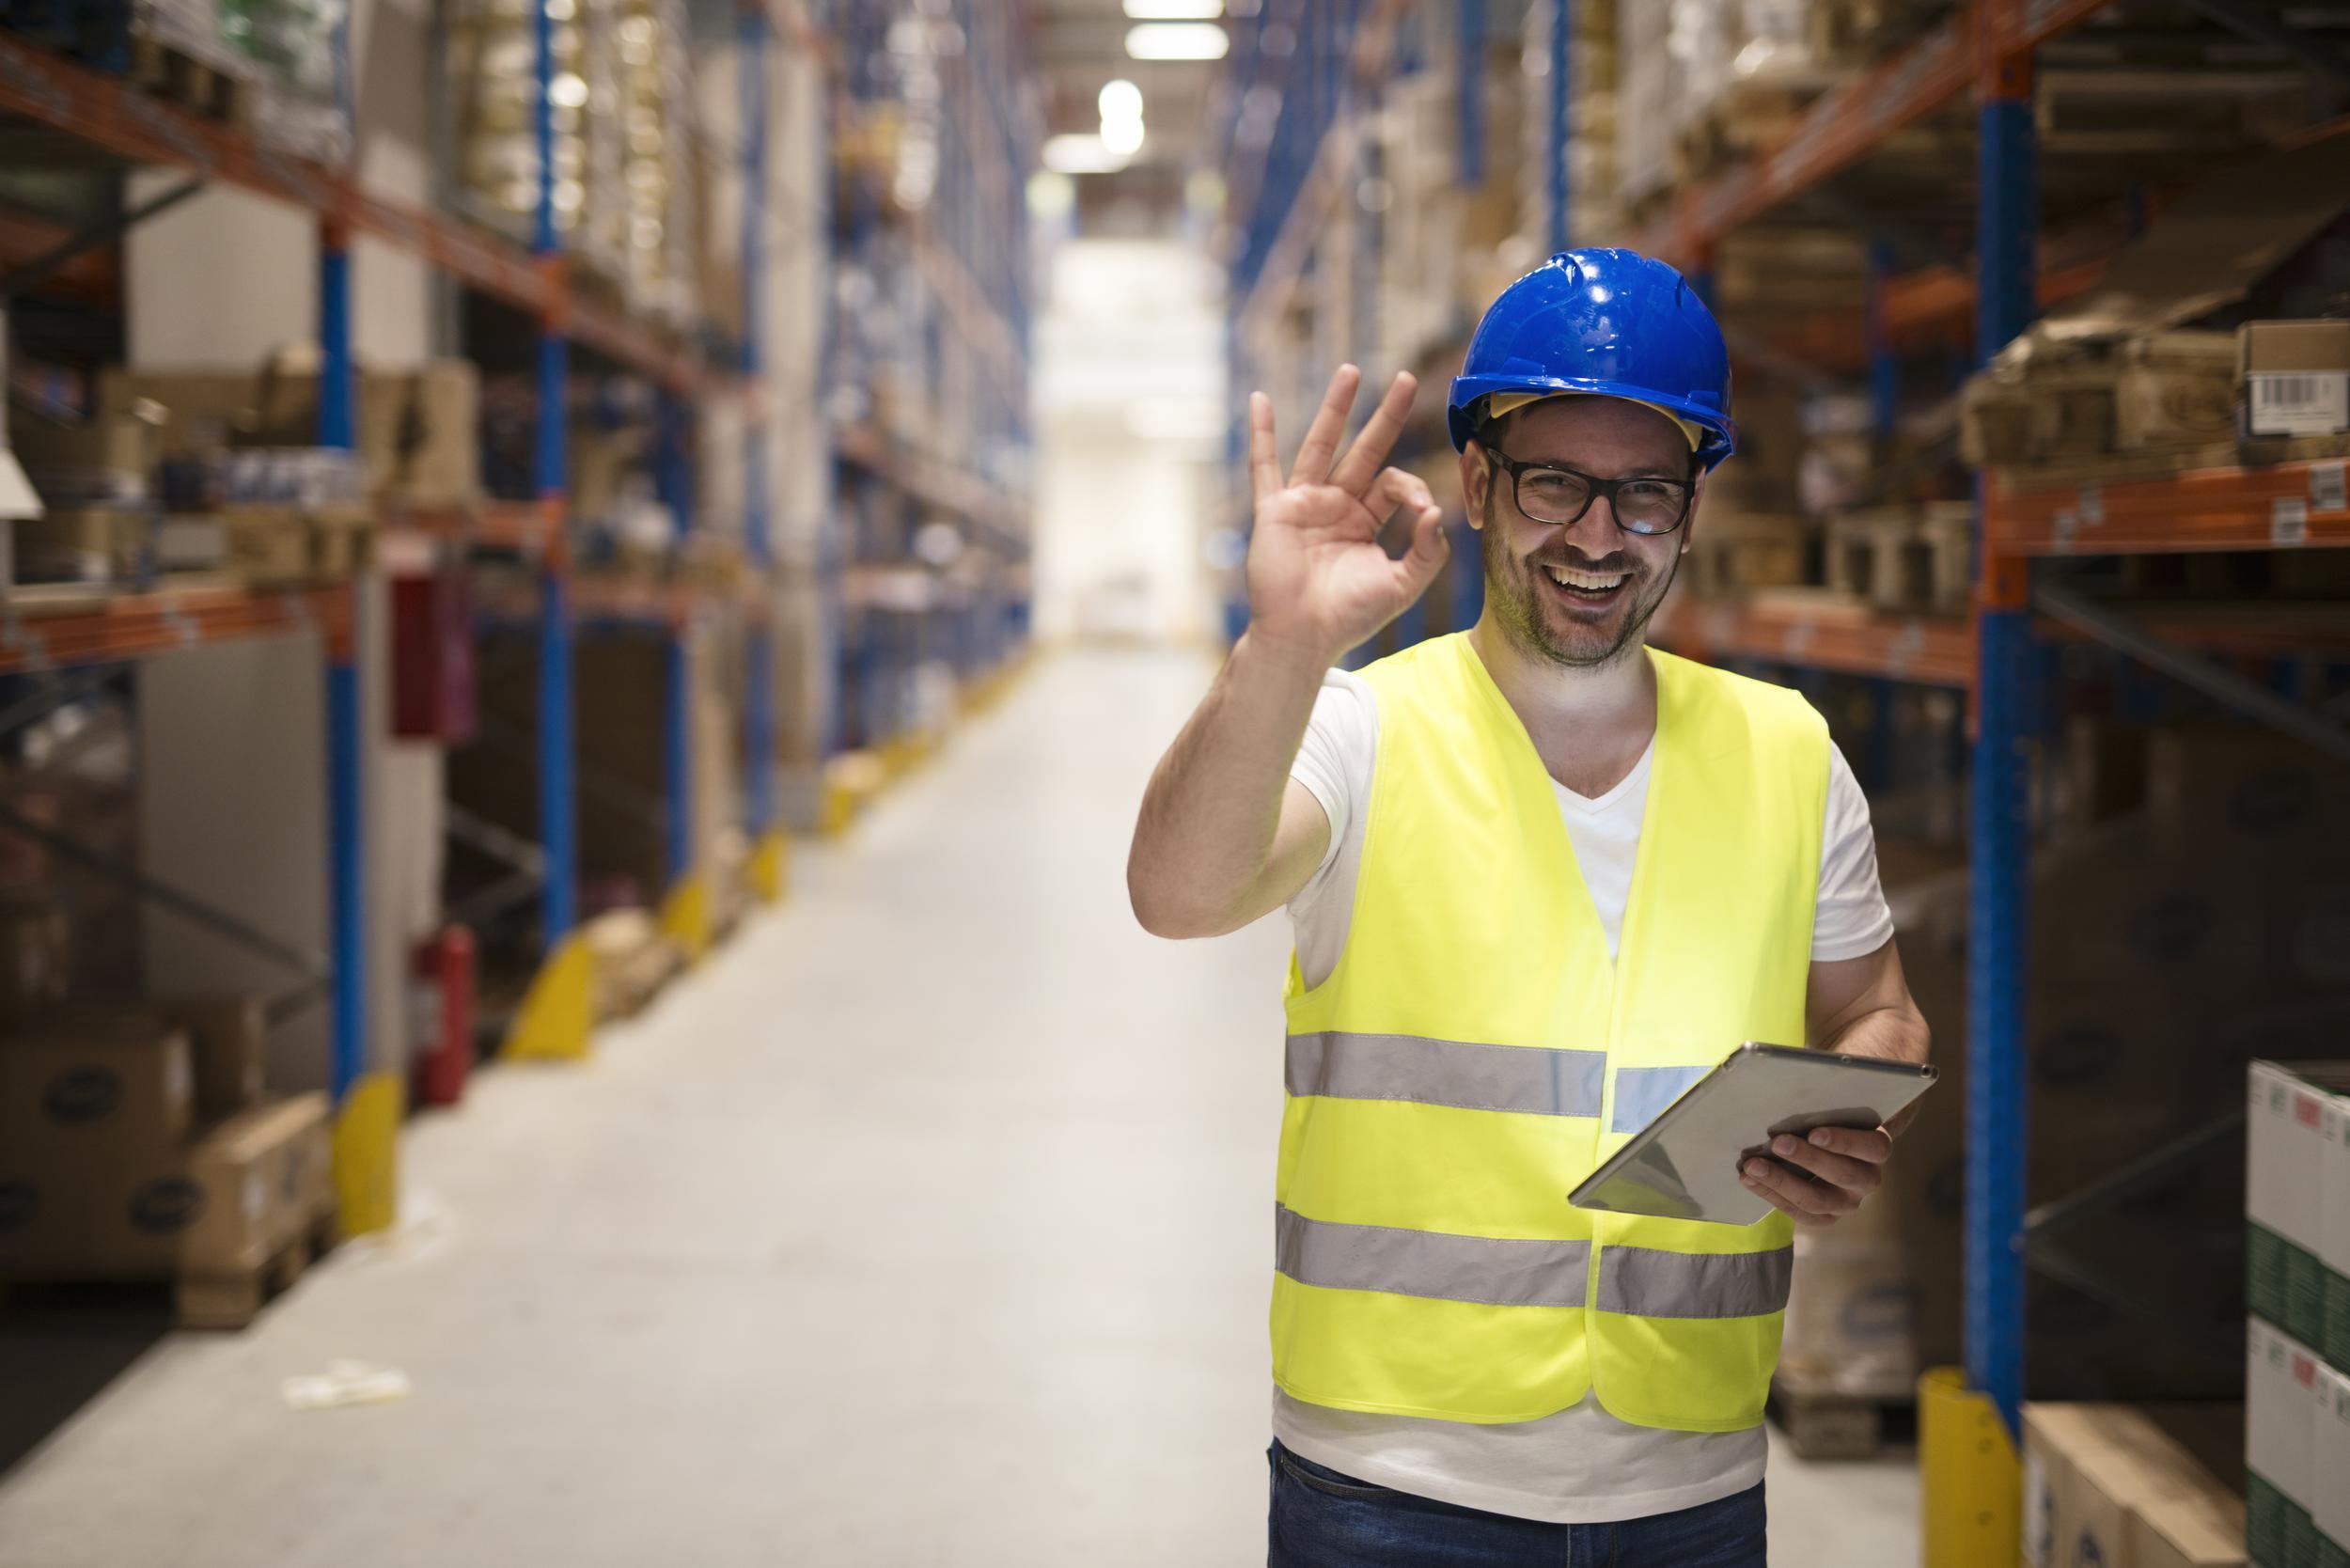 warehouse-worker-standing-large-storage-center-showing-ok-hand-gesture-satisfied-delivering-goods.jpeg